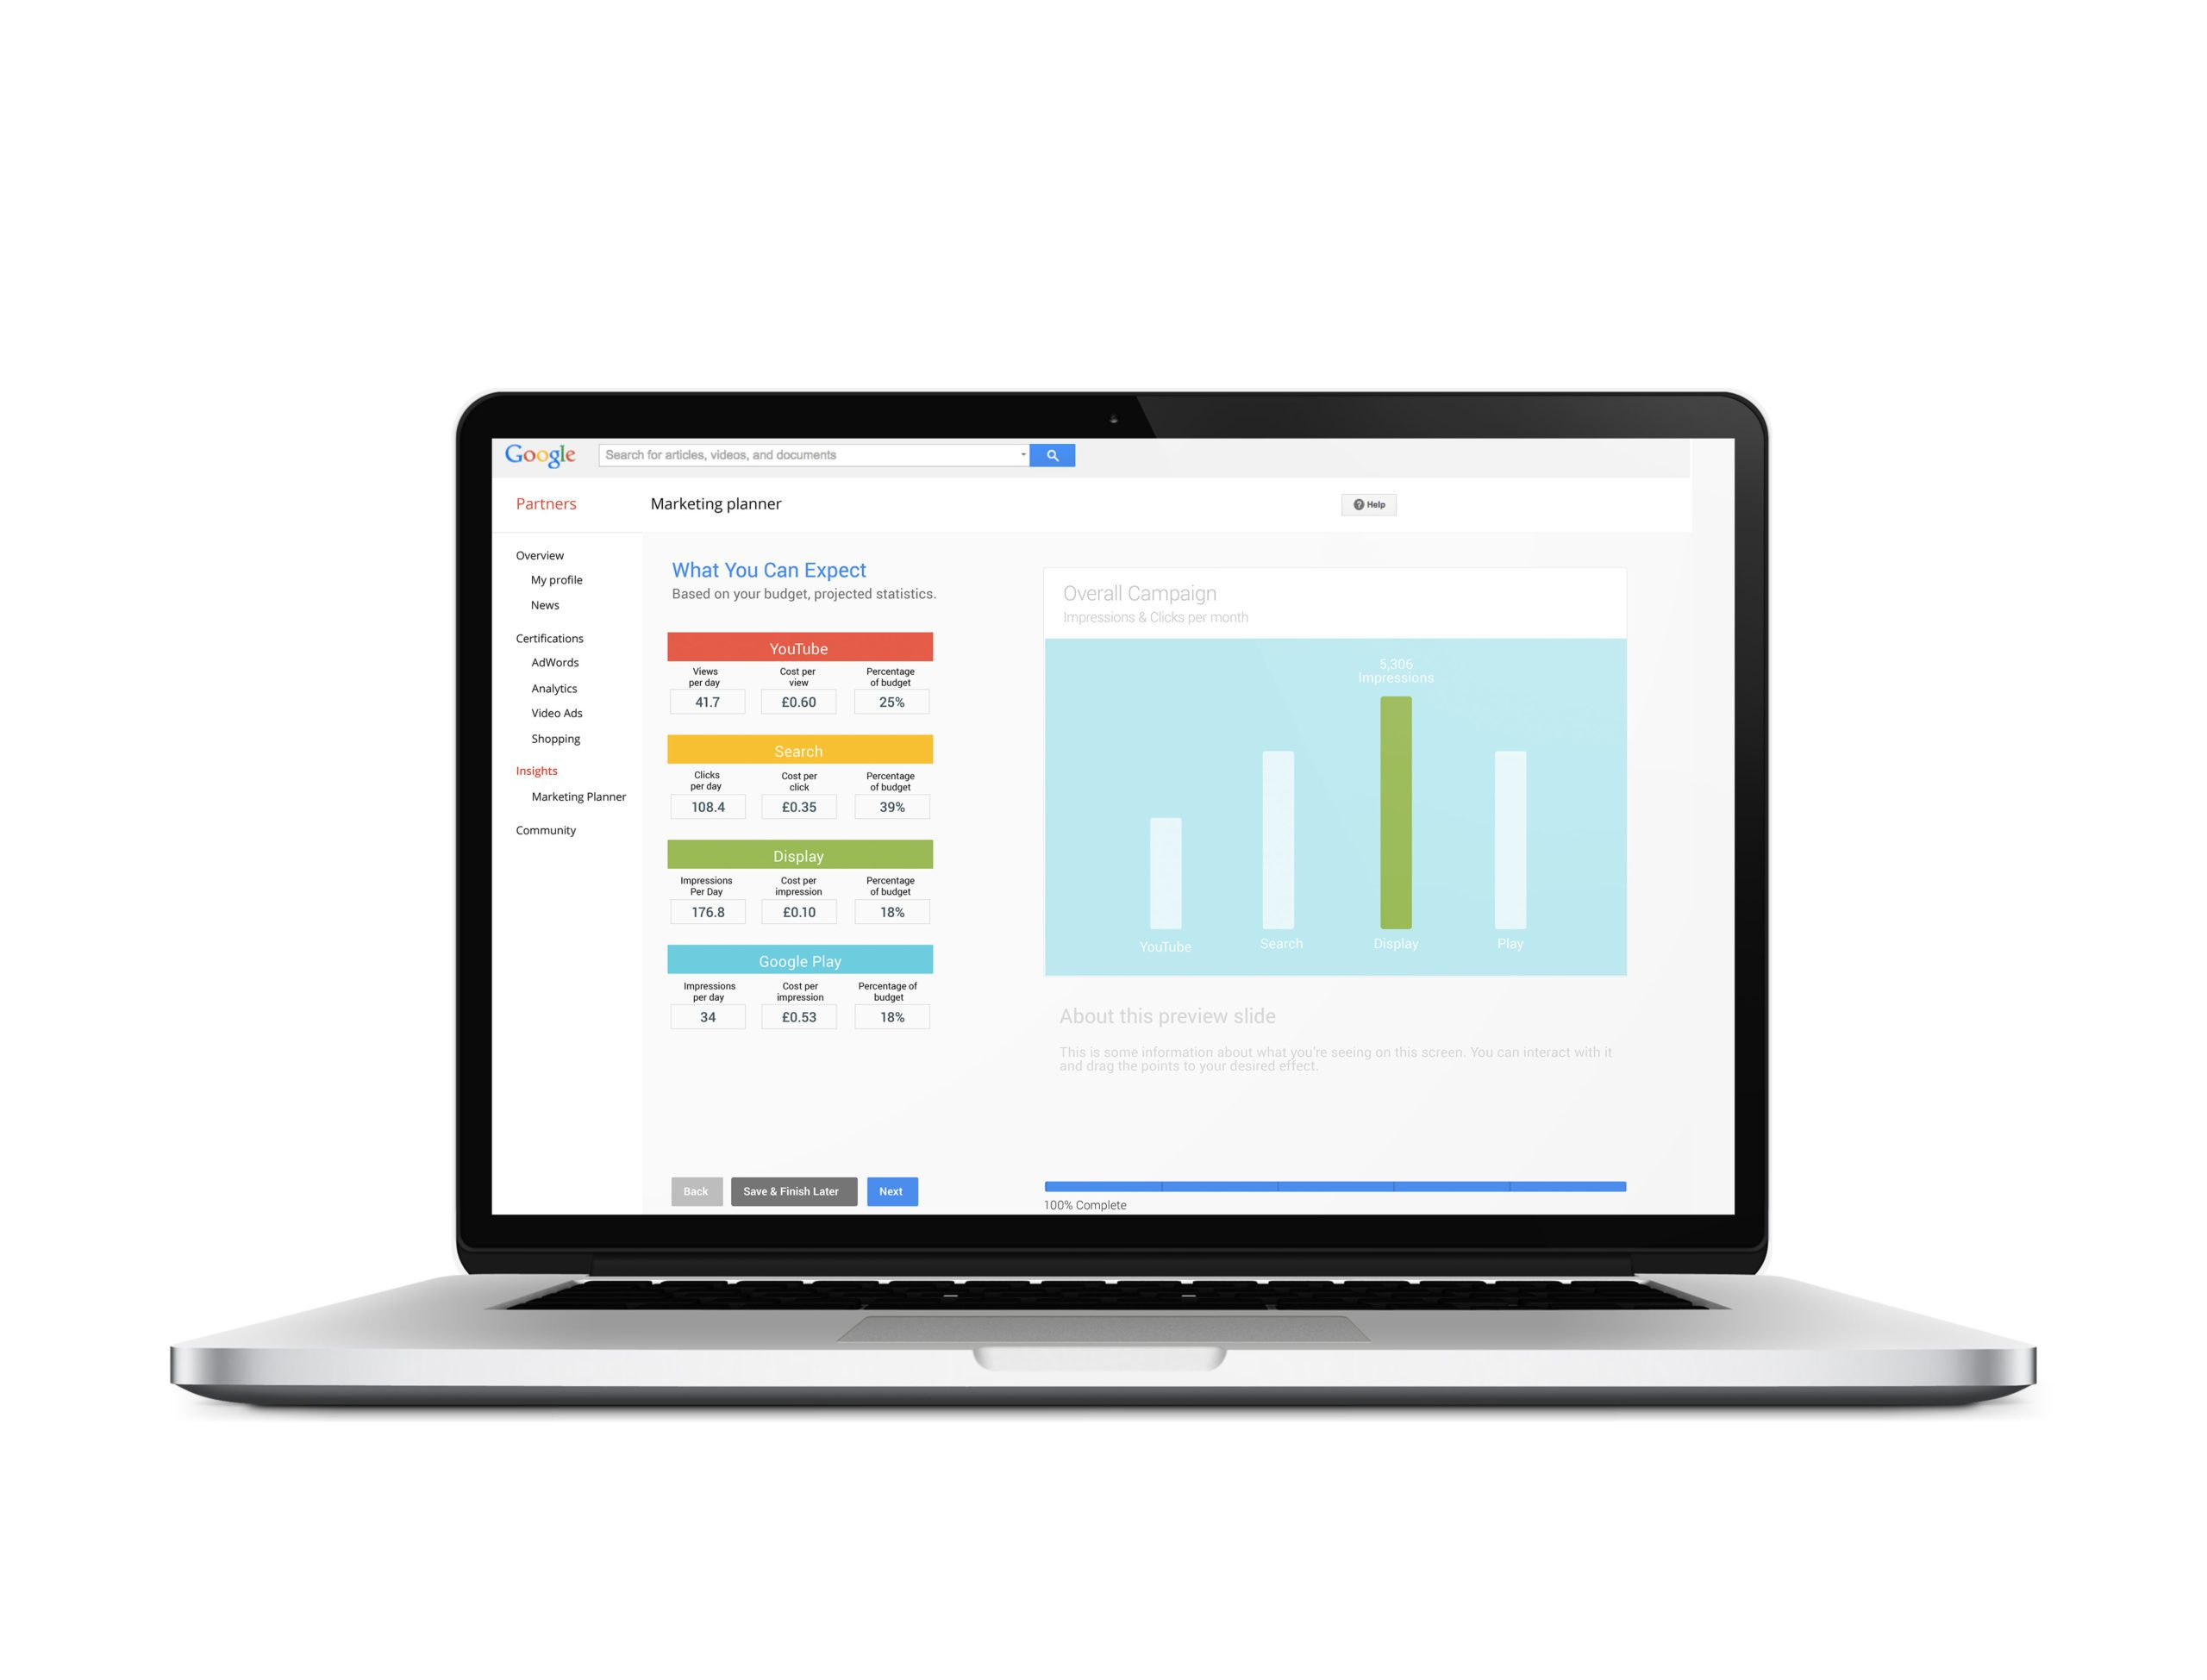 google-marketing-planner-macbook-screen6